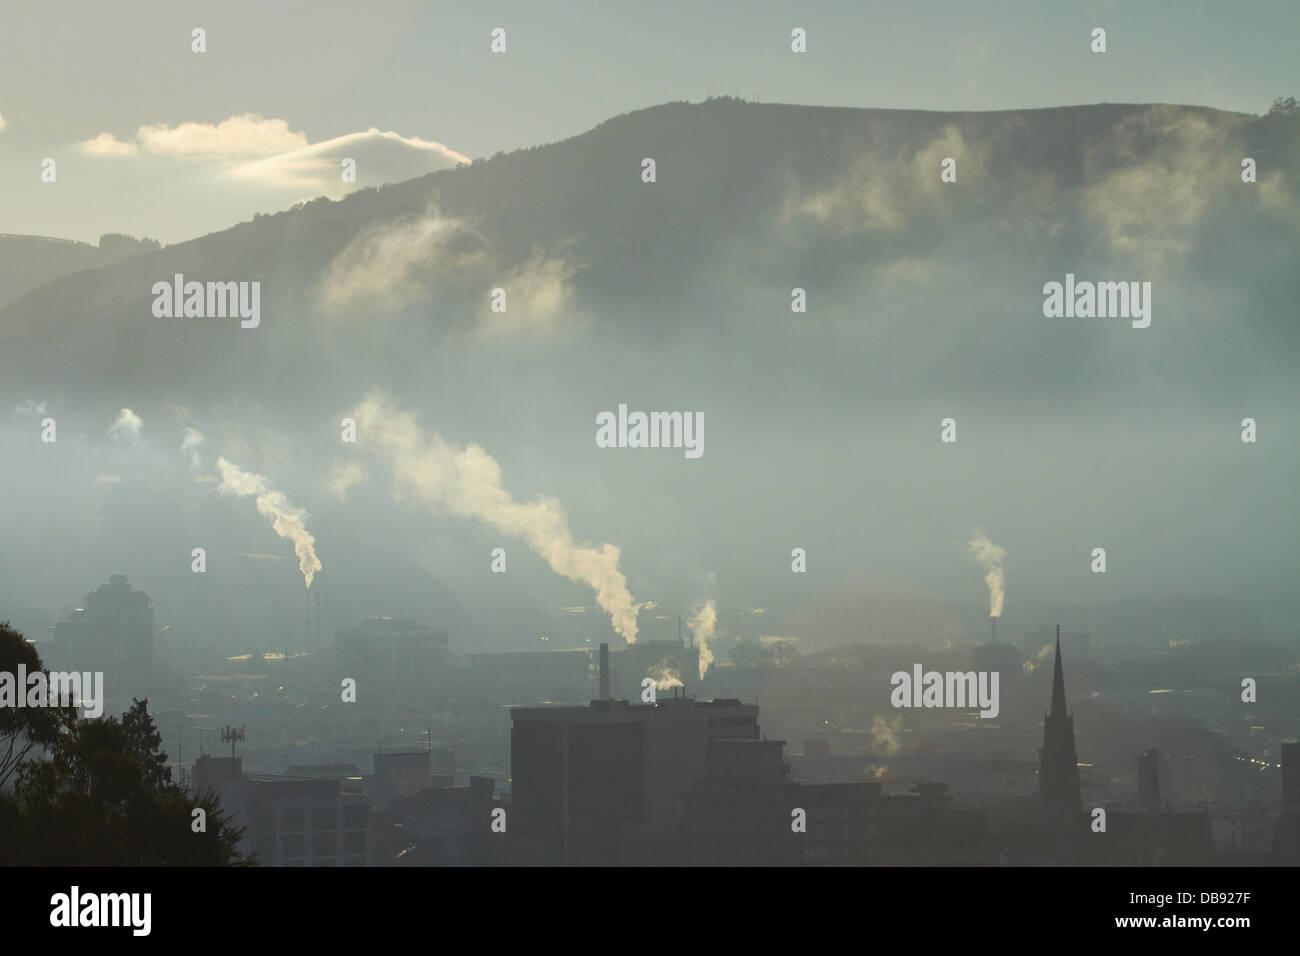 Air pollution, Dunedin, South Island, New Zealand - Stock Image